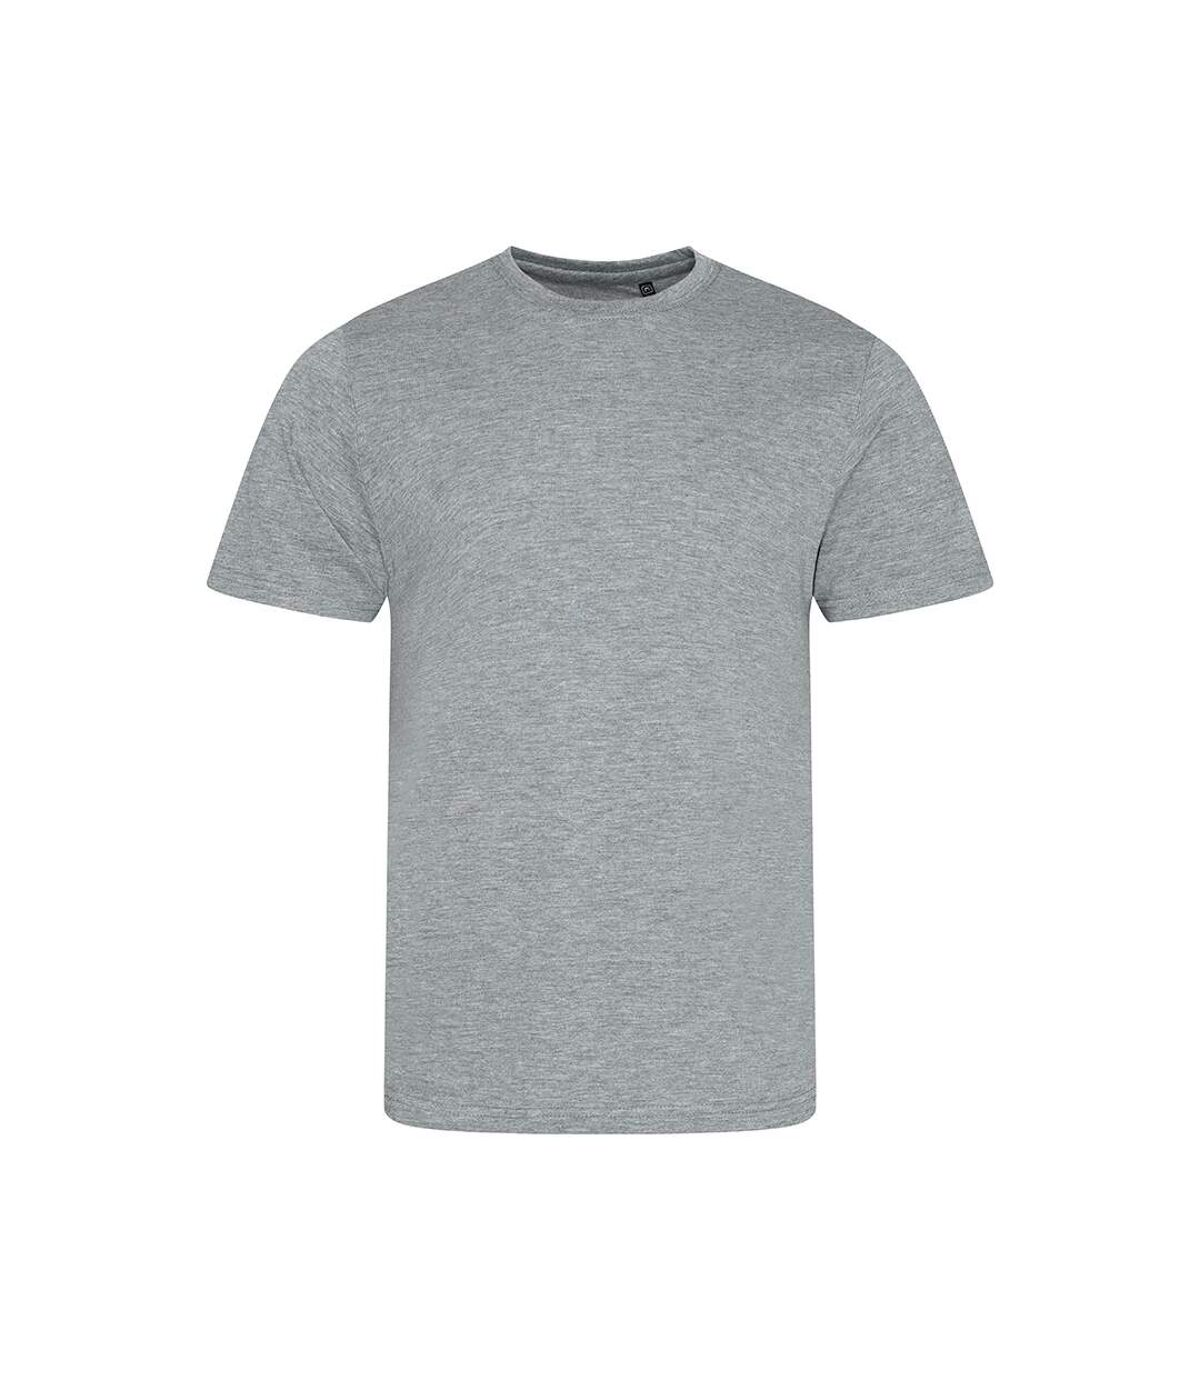 AWDis Mens Tri Blend T Shirt (Heather Charcoal) - UTPC2894